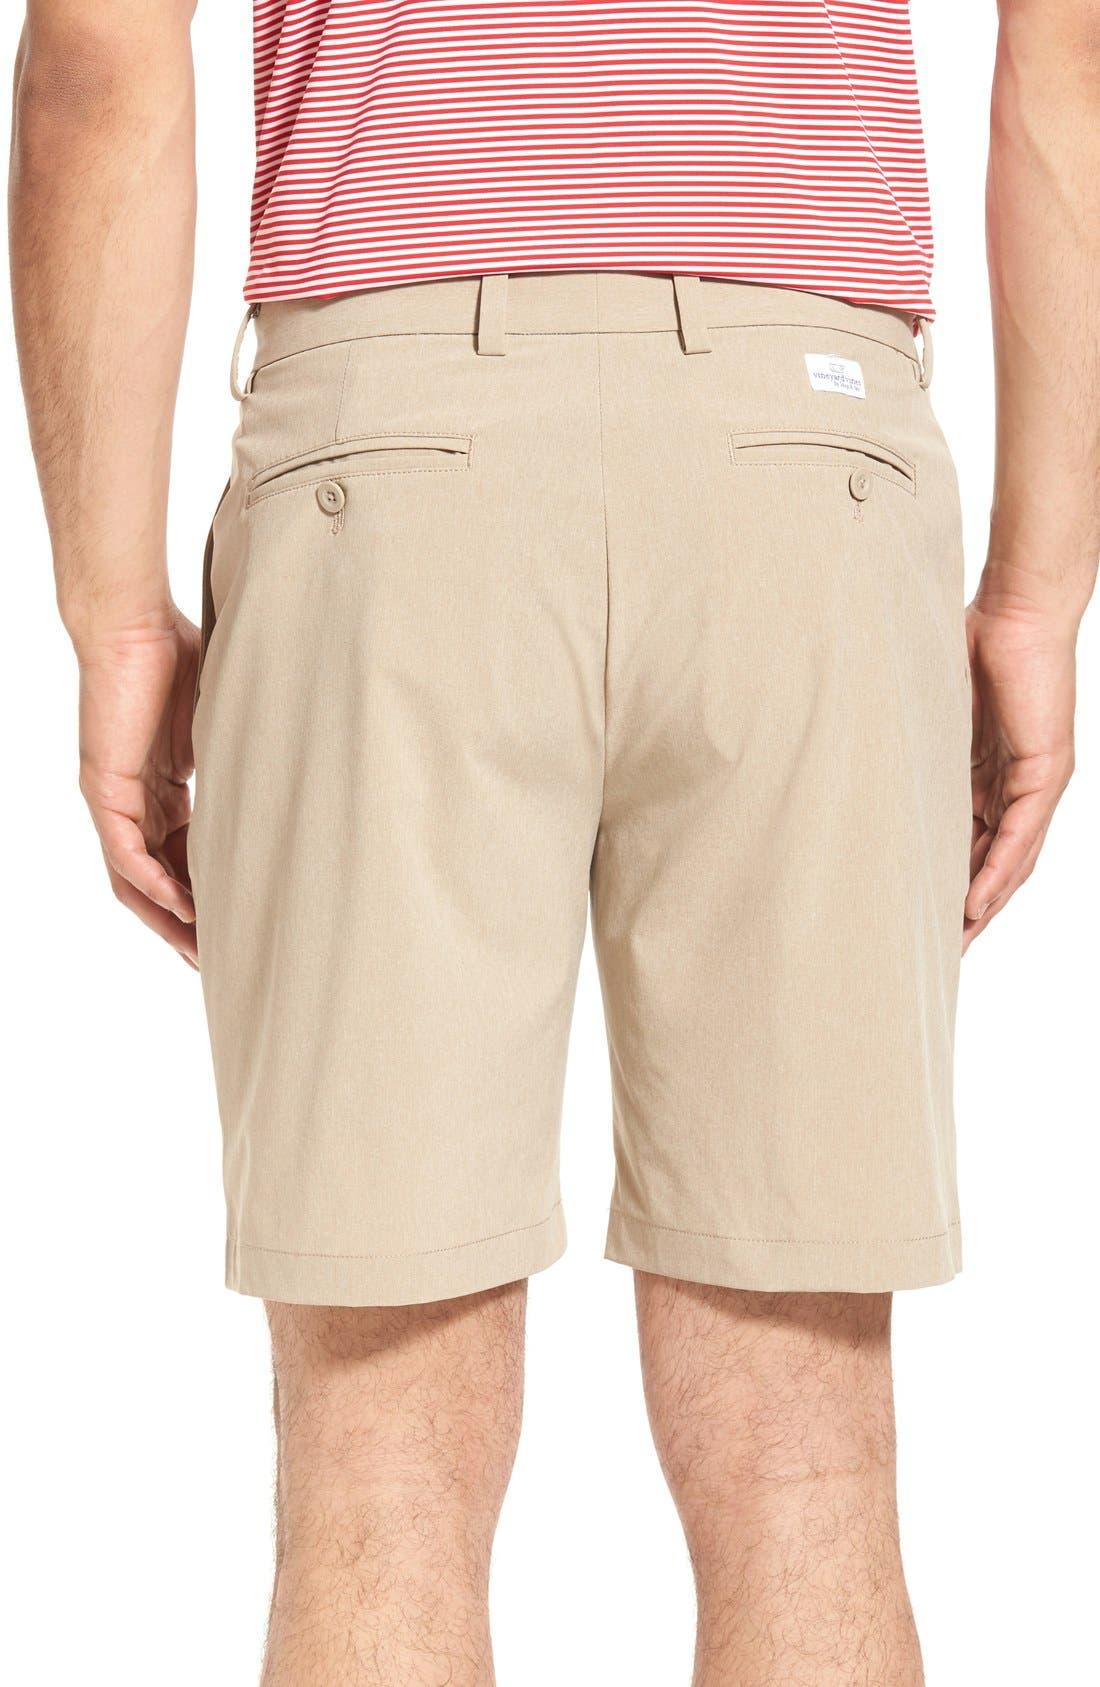 8 Inch Performance Breaker Shorts,                             Alternate thumbnail 33, color,